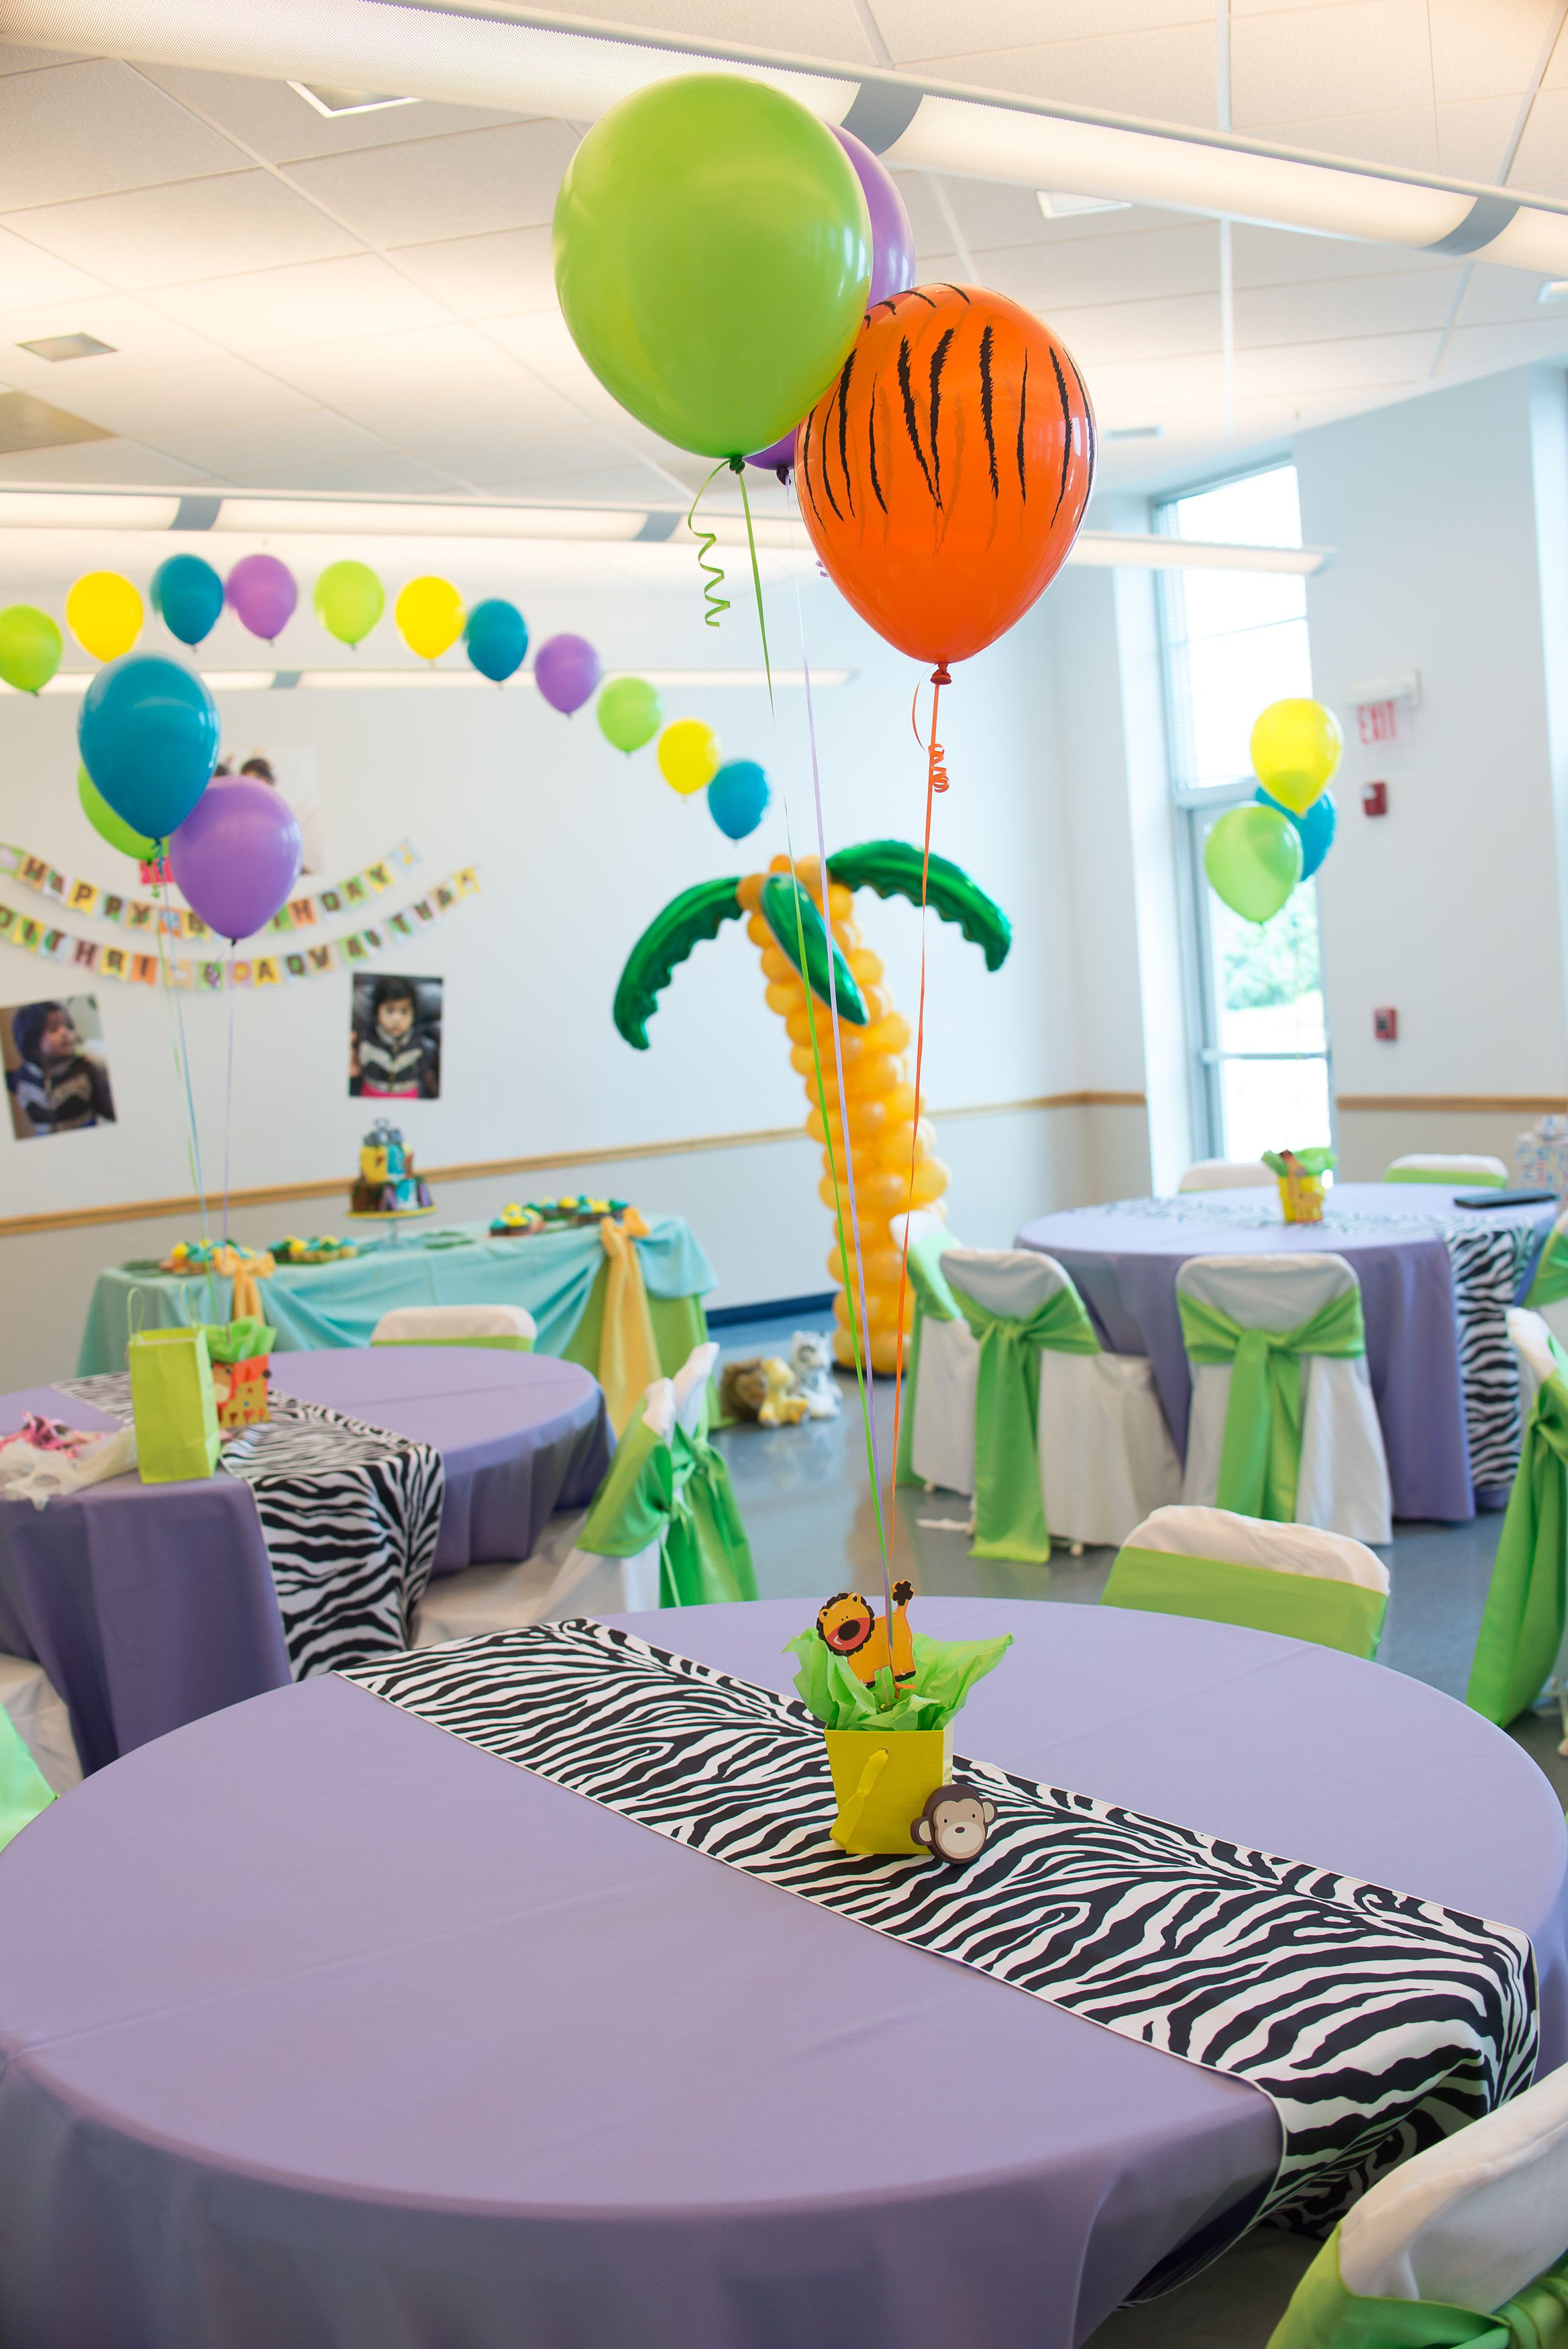 1St Birthday Jungle Theme Table Decoration Balloon Centerpiece Palm Tree